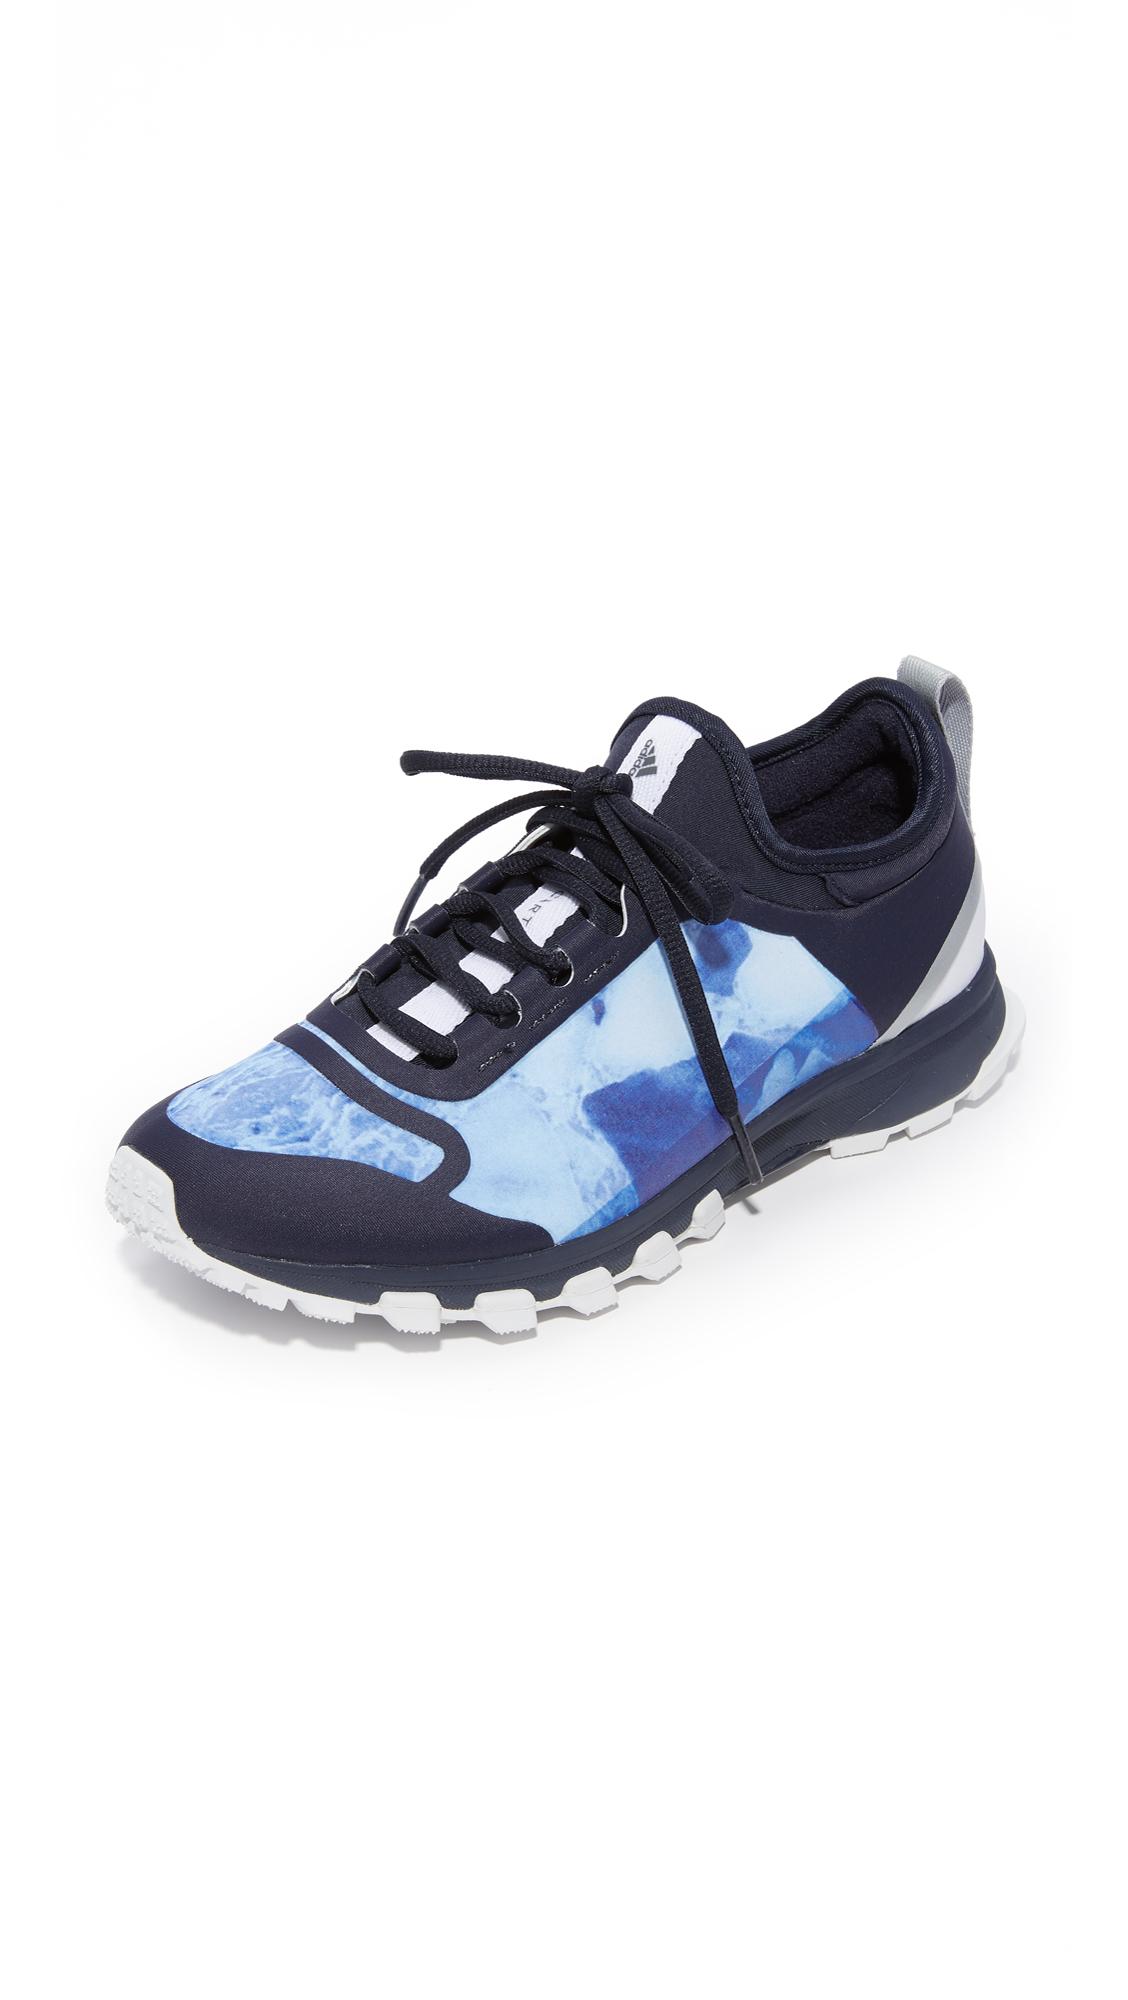 adidas by Stella McCartney Adizero XT Printed Sneakers